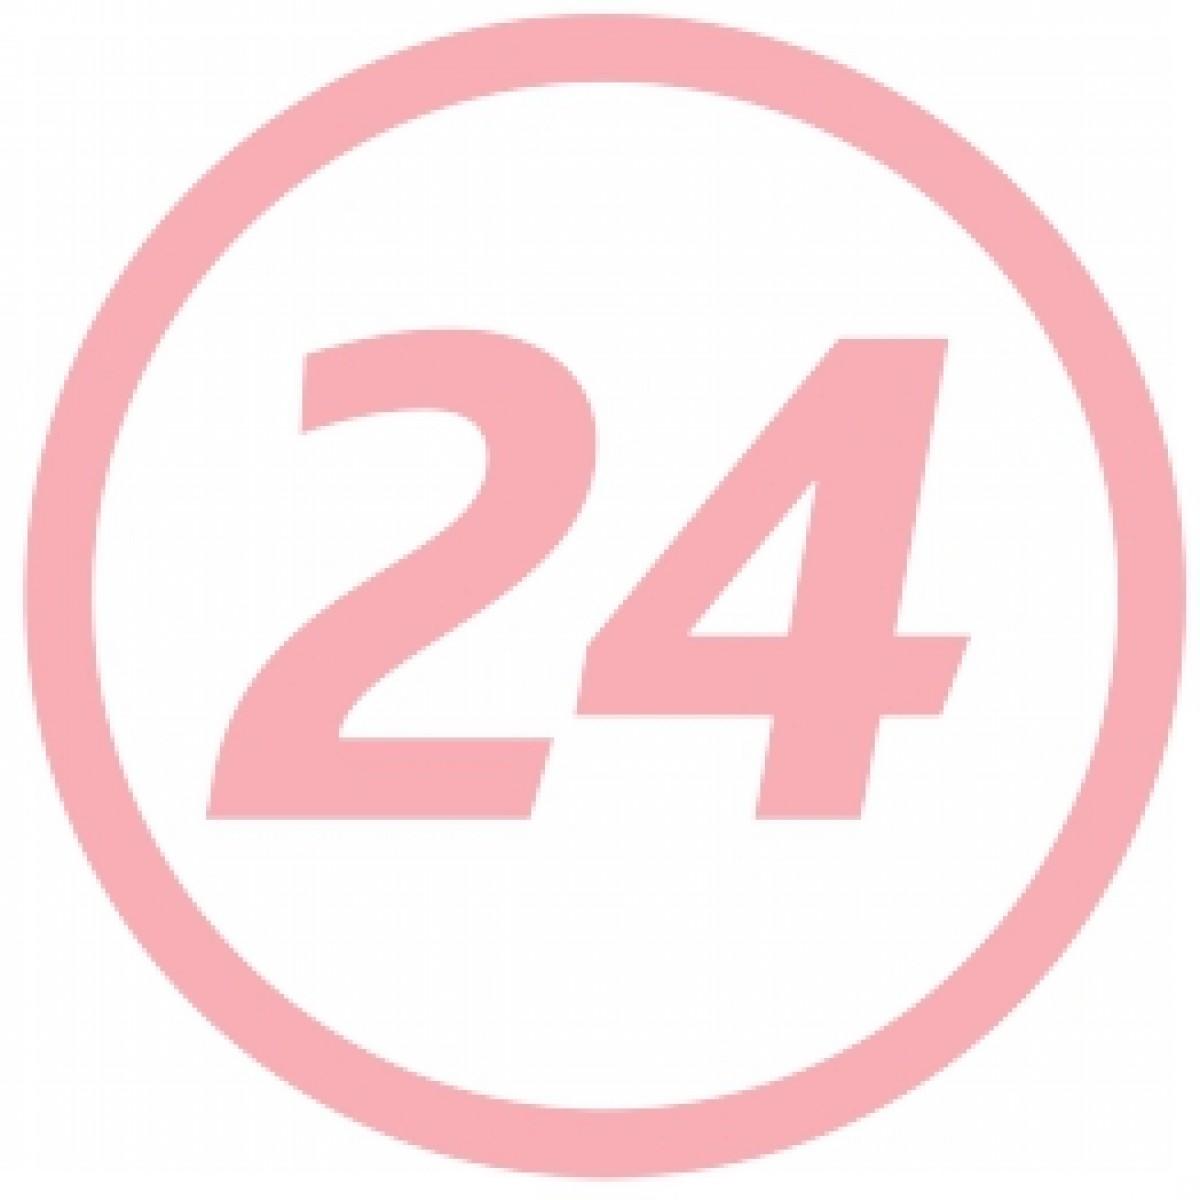 Dermaplast Universal 2 Marimi Rezistent la Apa, Plasture, 20buc